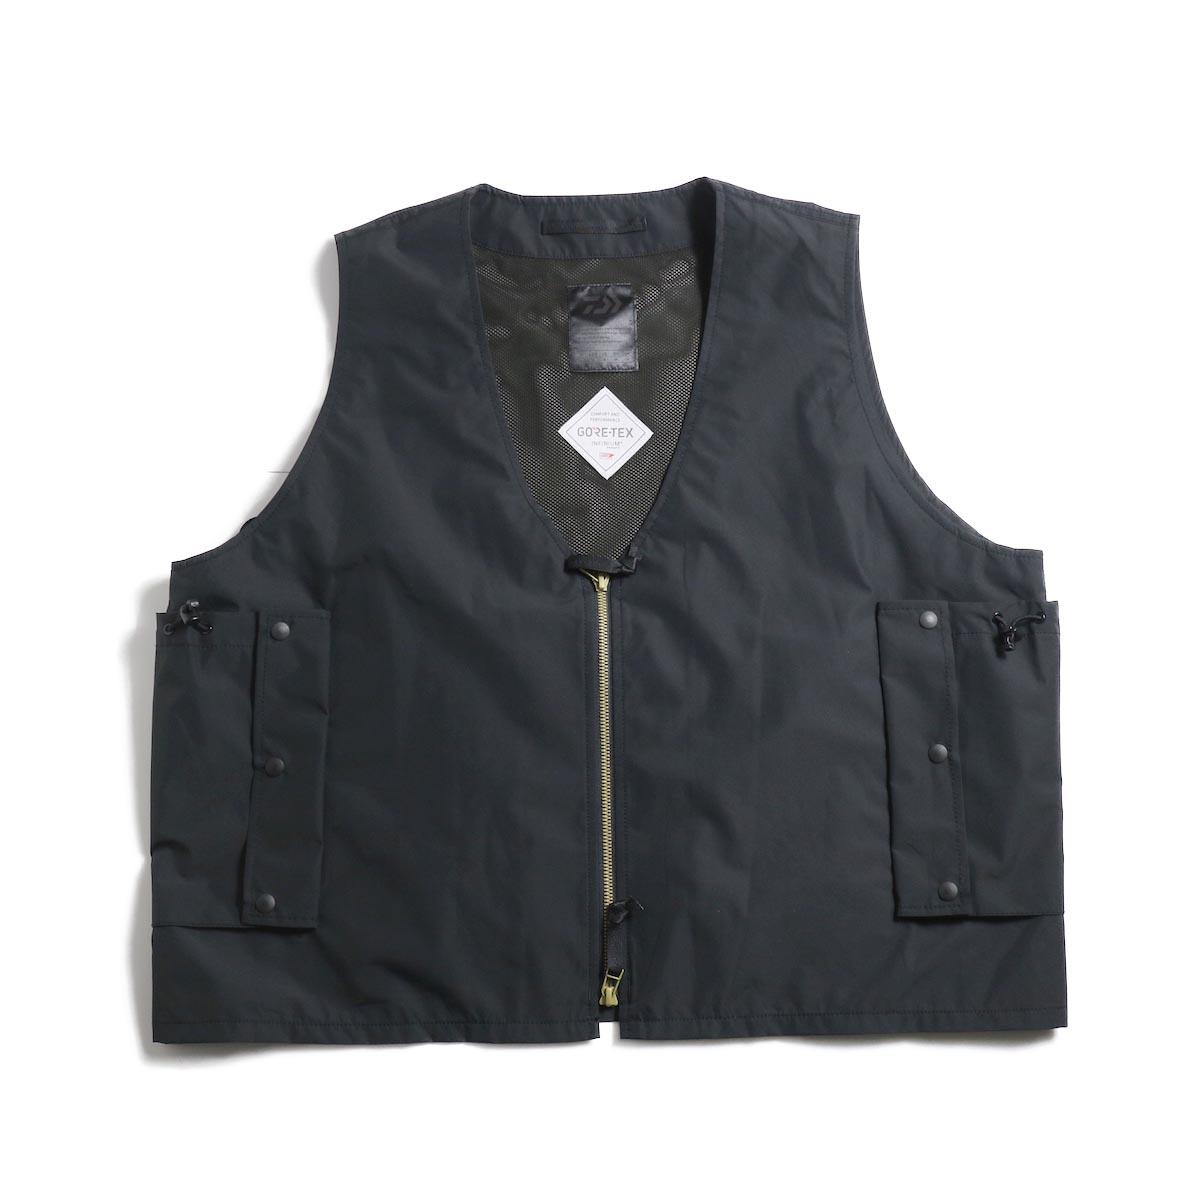 DAIWA PIER39 / GORE-TEX INFINIUM 3way Radio Vest (Black)